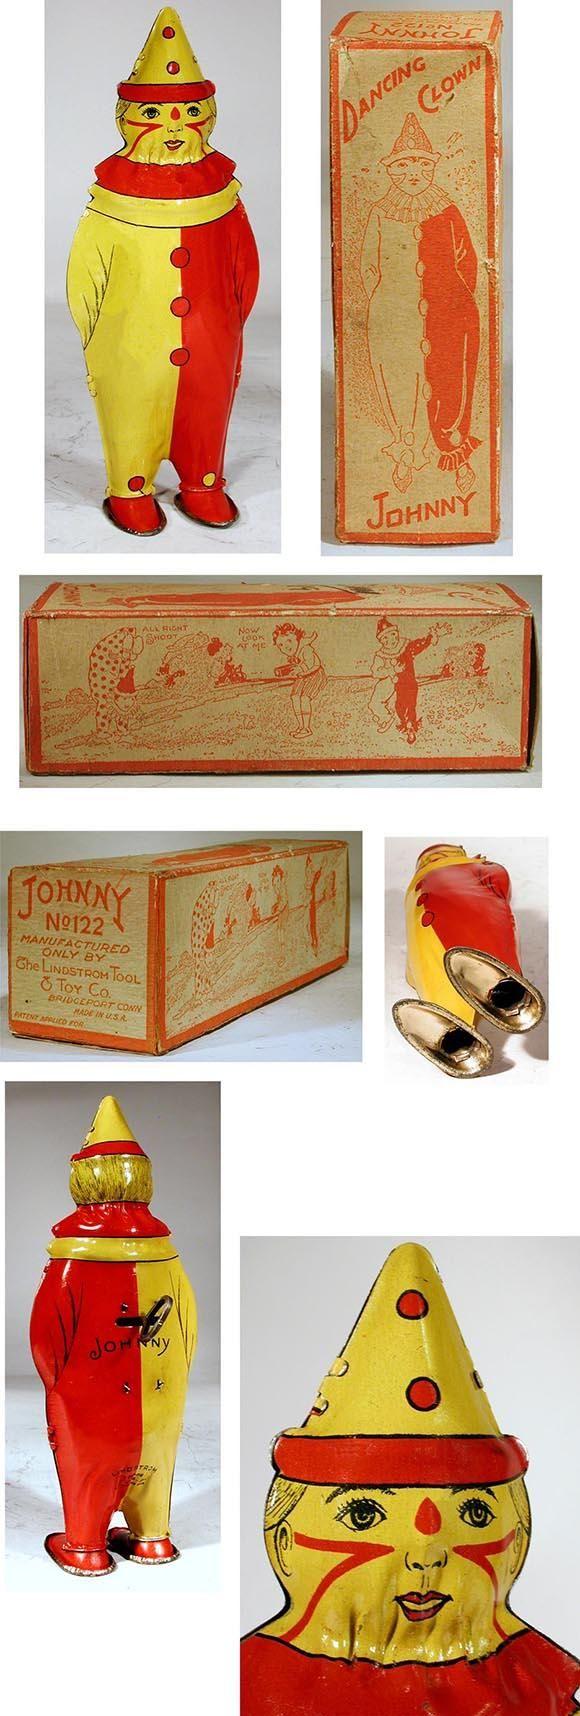 c.1928 Lindstrom, No.122 Johnny Dancing Clown in Original Box